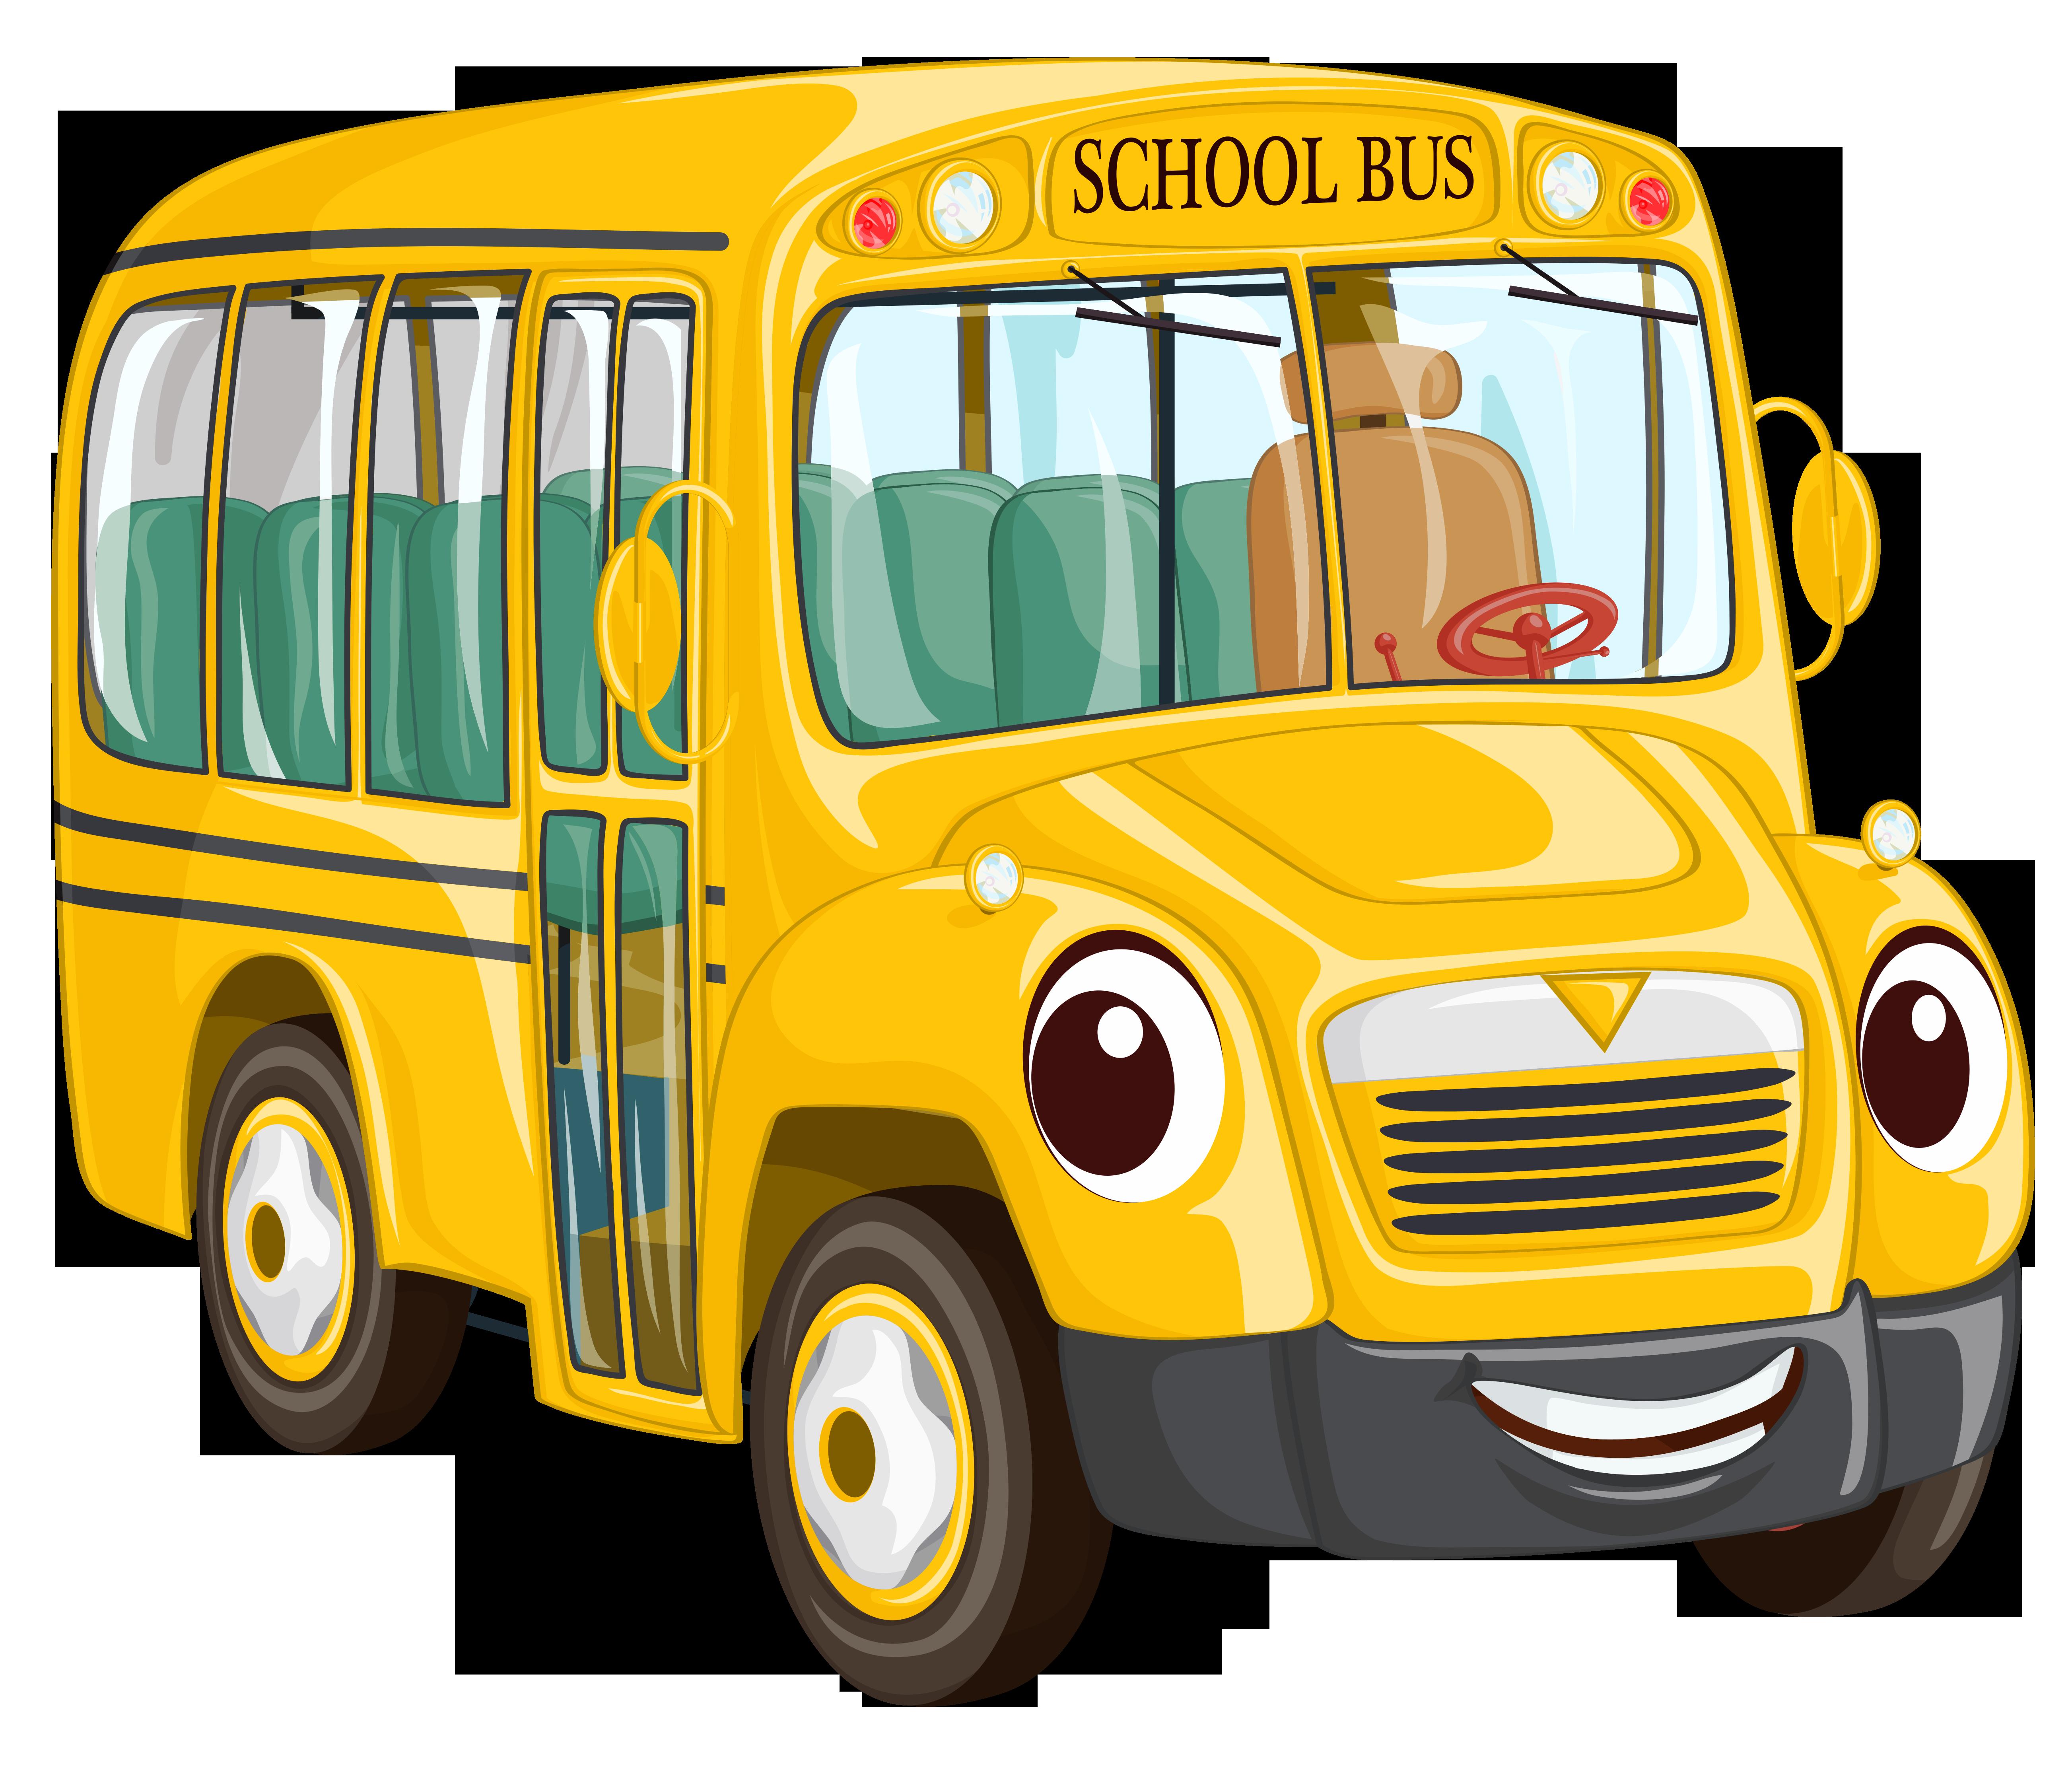 School bus clipart images 3 school bus clip art vector 5 2